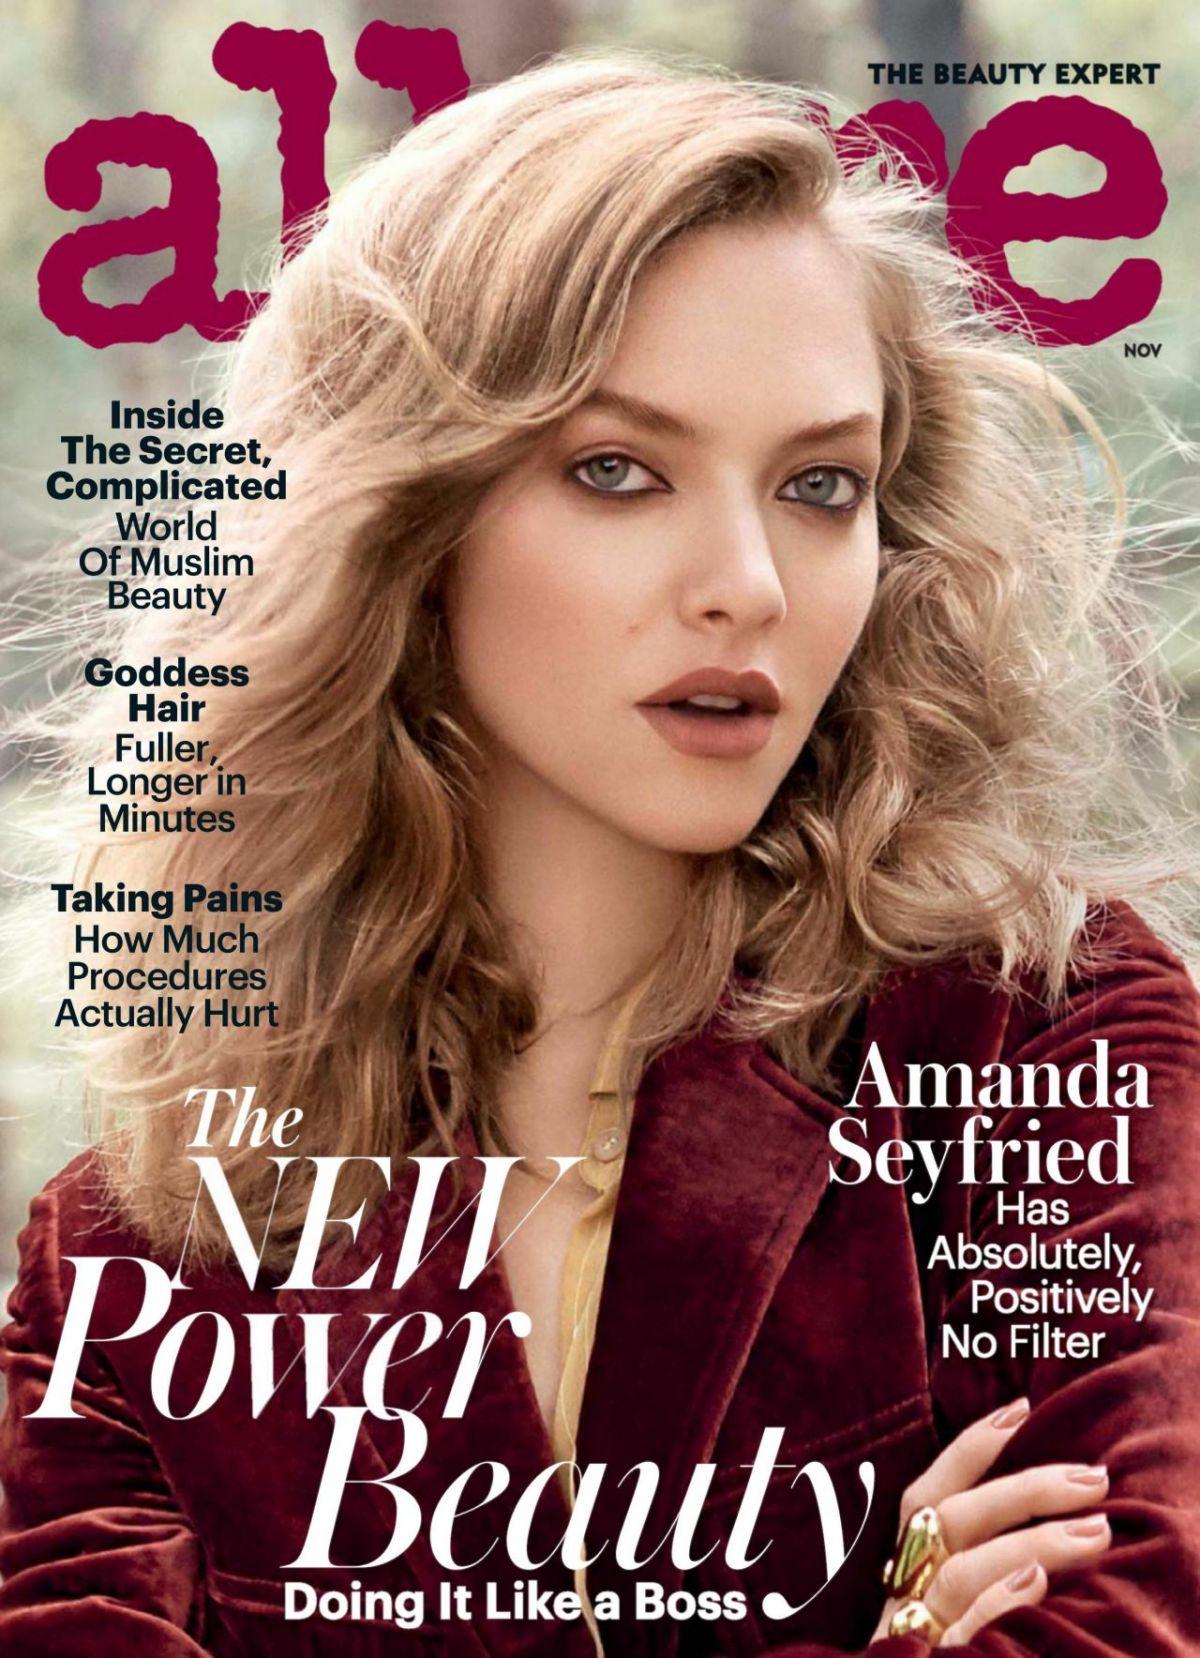 AMANDA SEYFRIED in Allure Magazine, November 2016 Issue